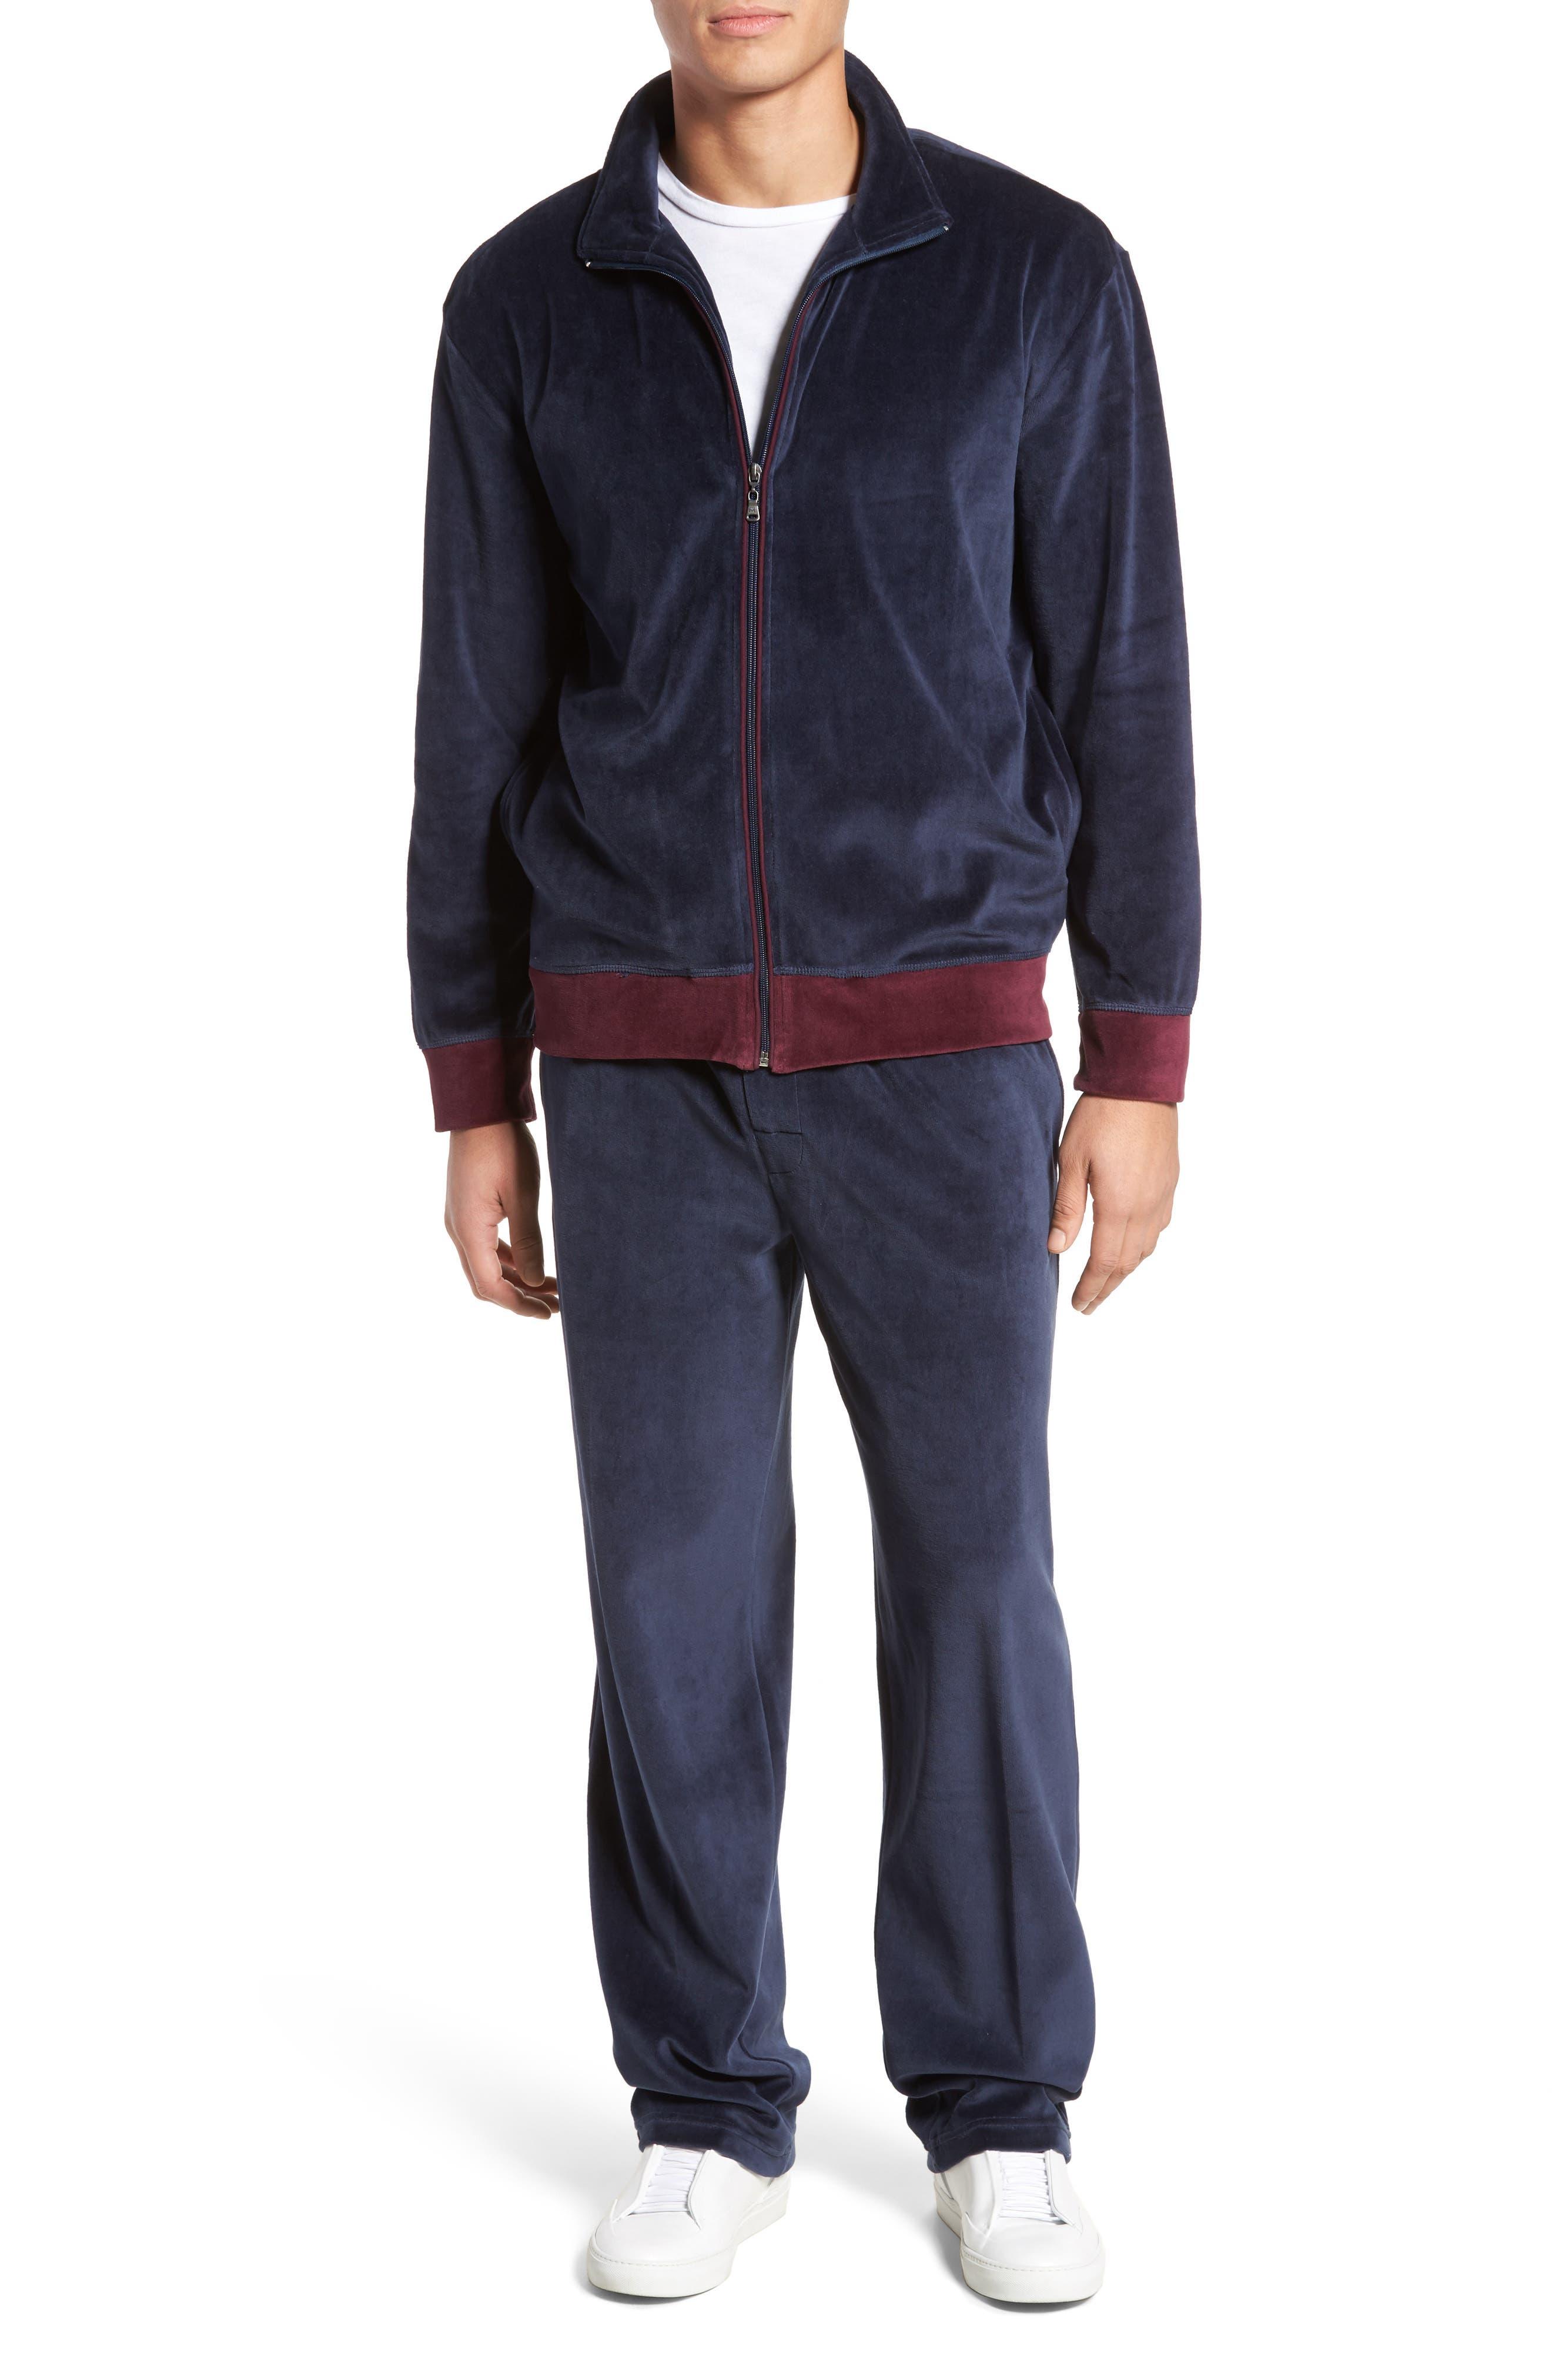 Majestic International Strathcona Velour Warm-Up Suit